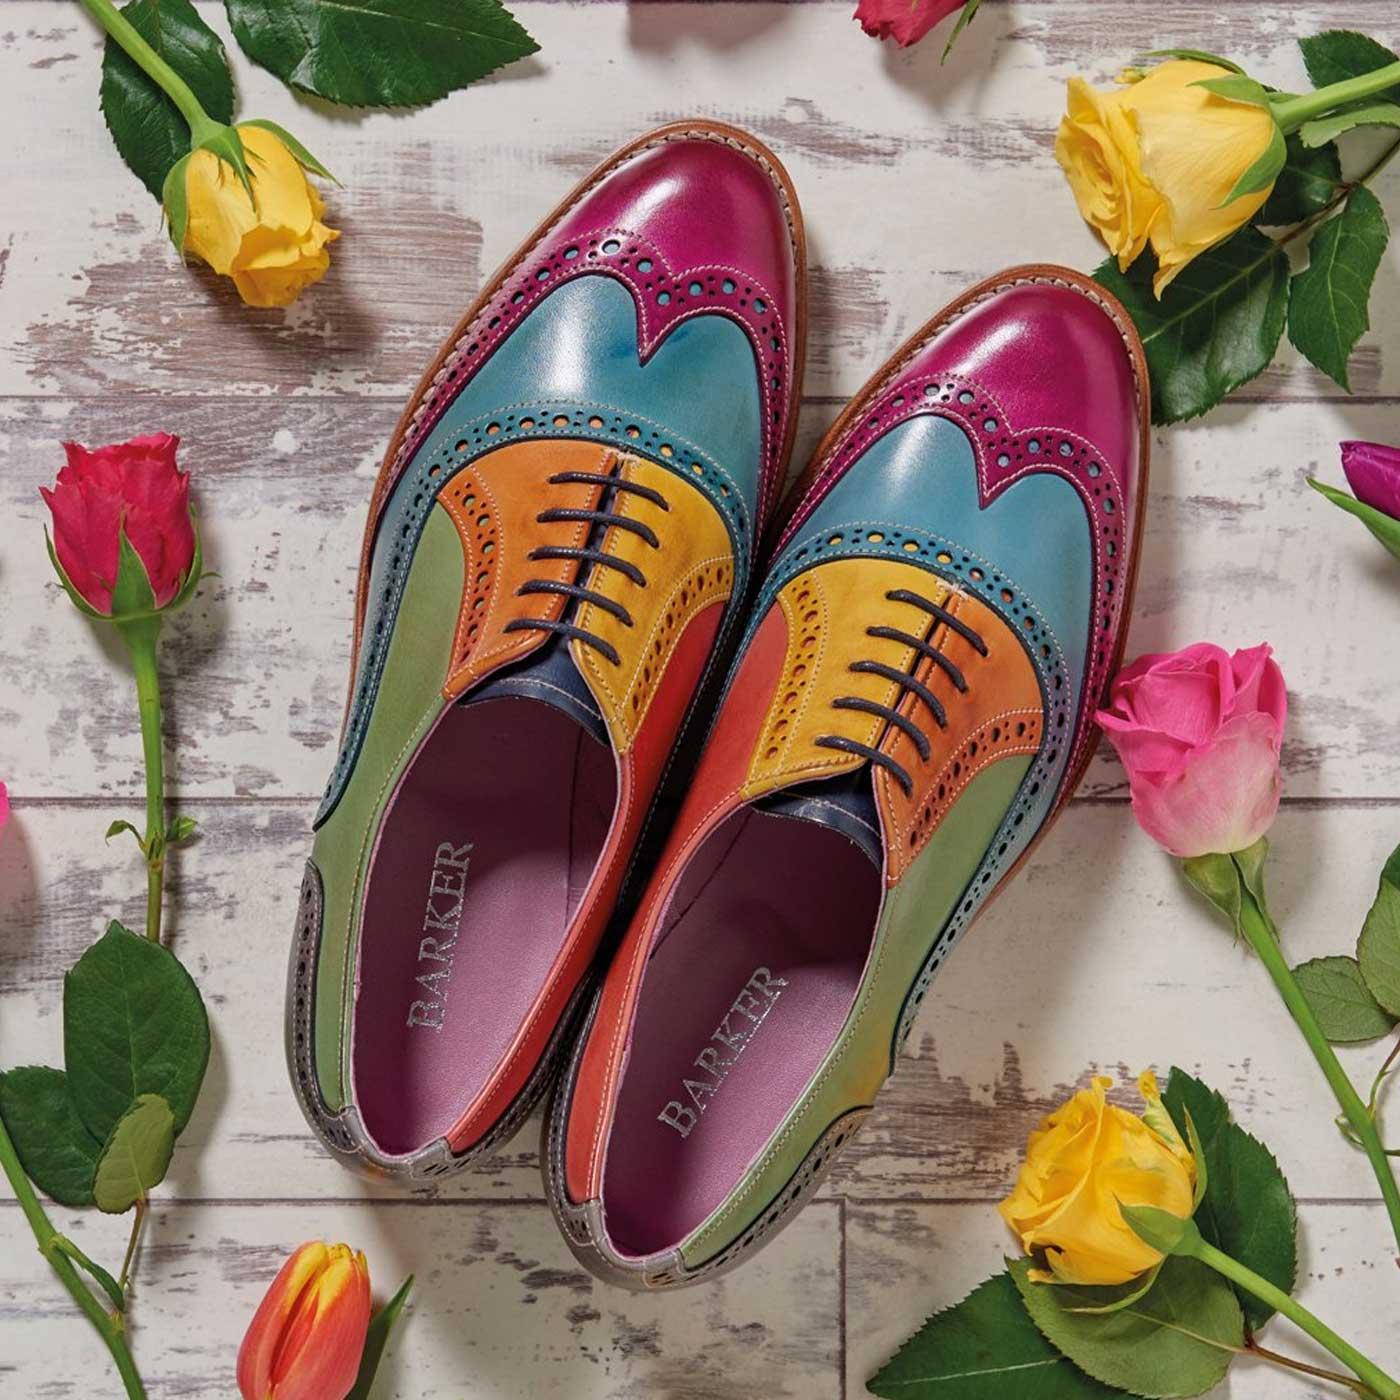 BARKER Fearne Shoes Ladies Brogues